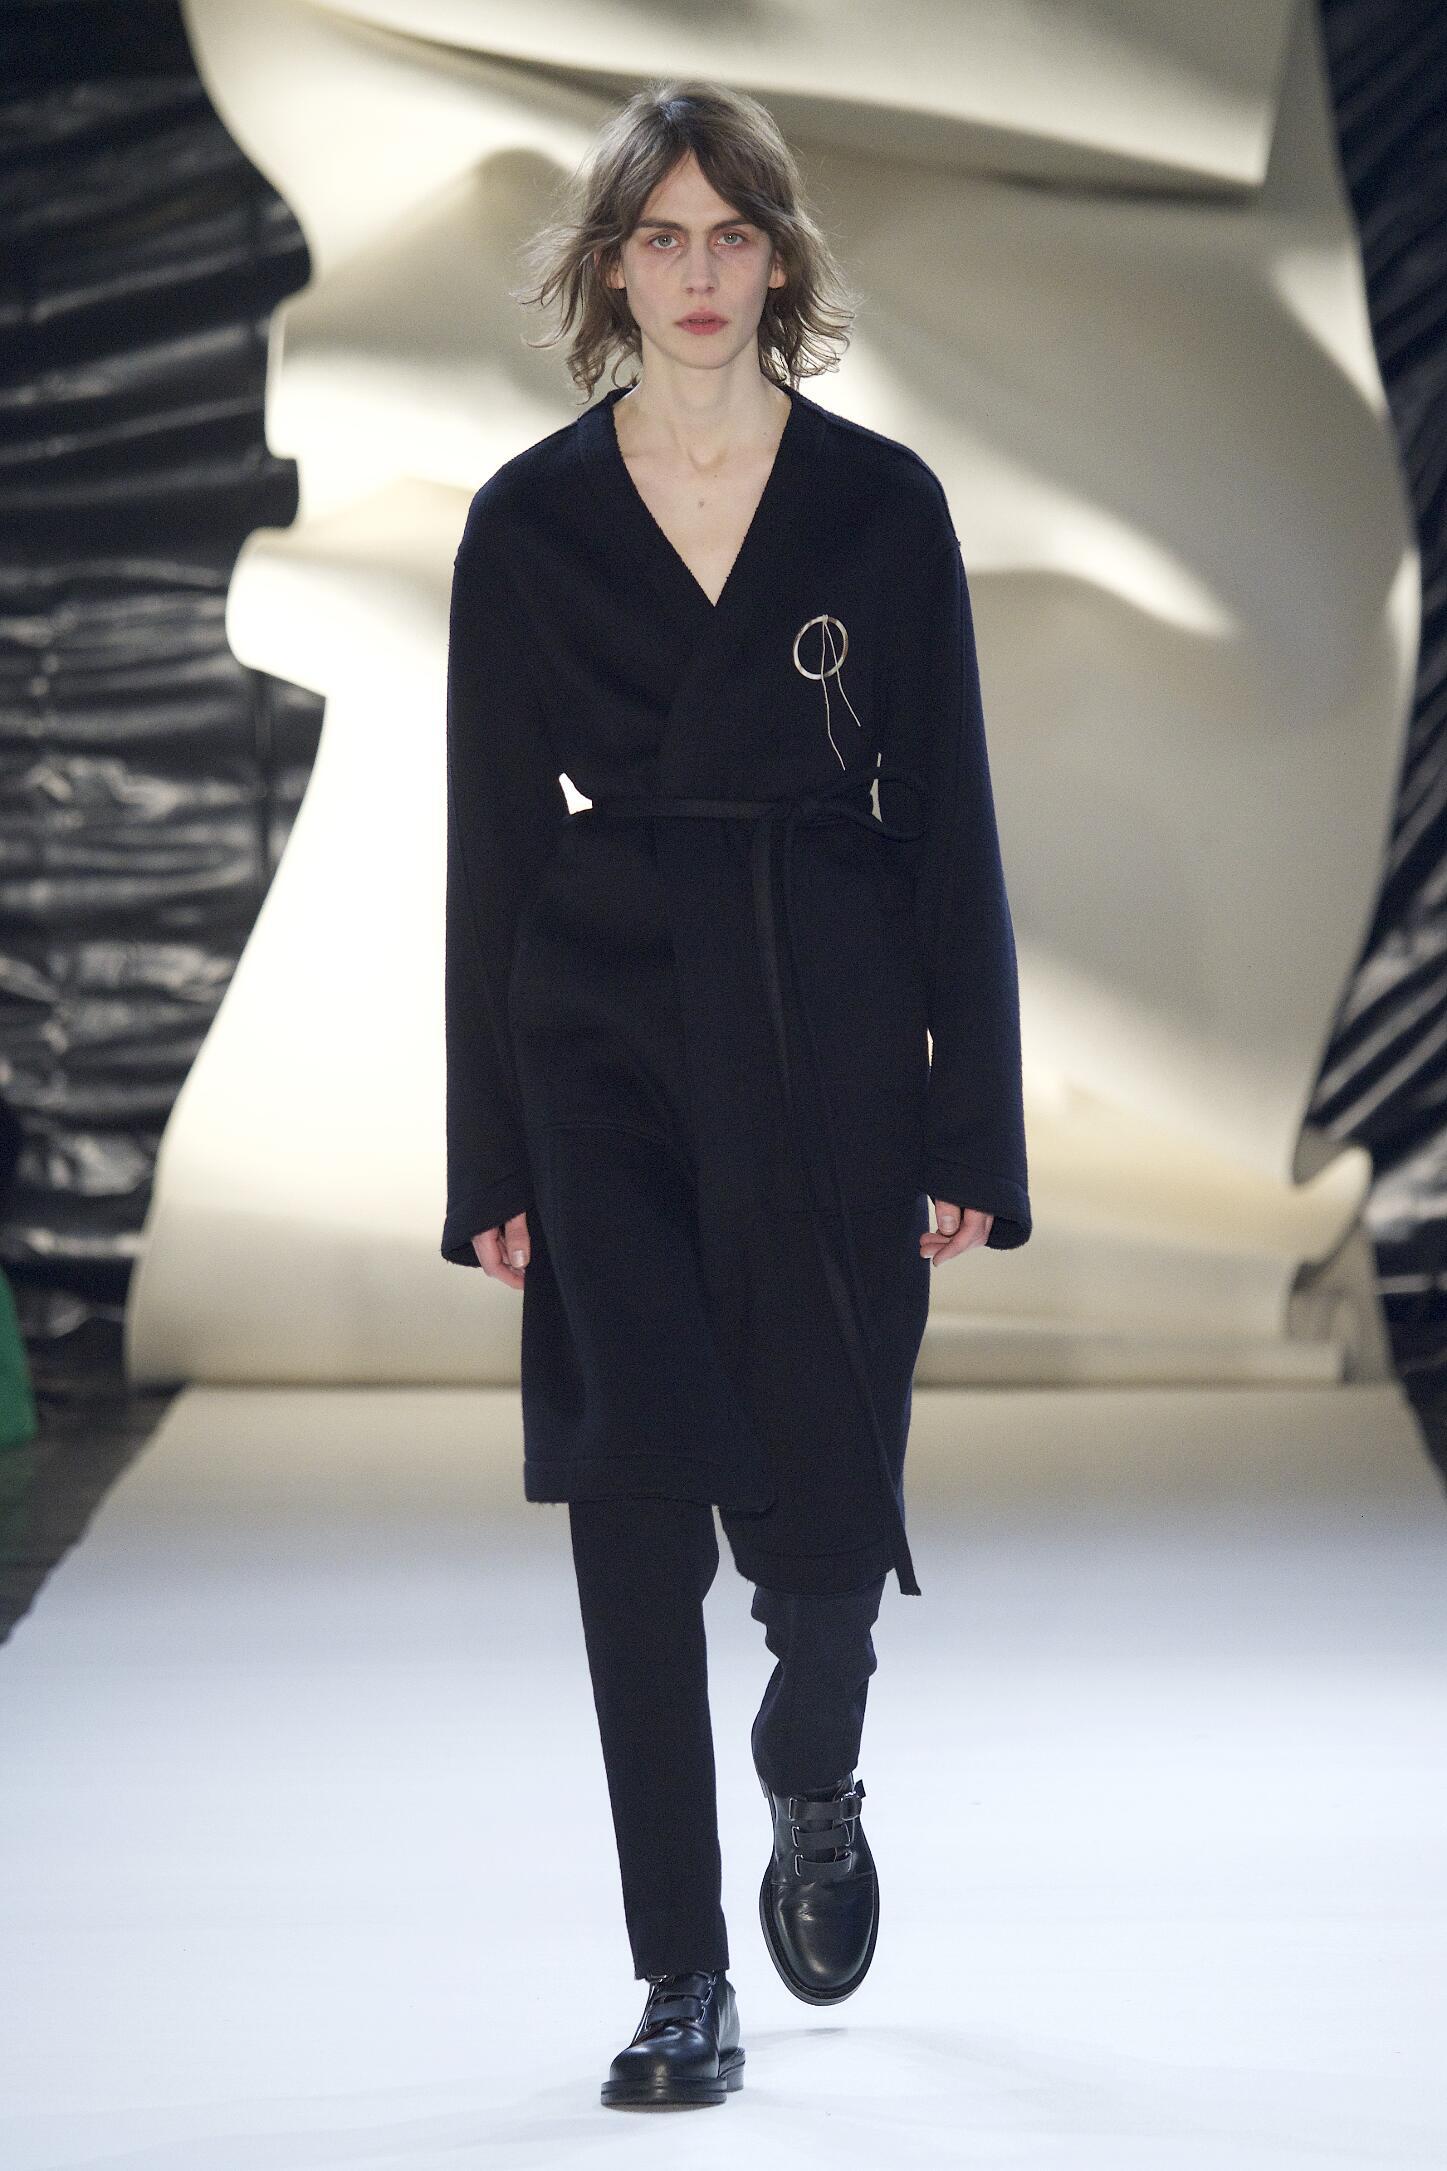 Winter 2015 Fashion Show Damir Doma Collection